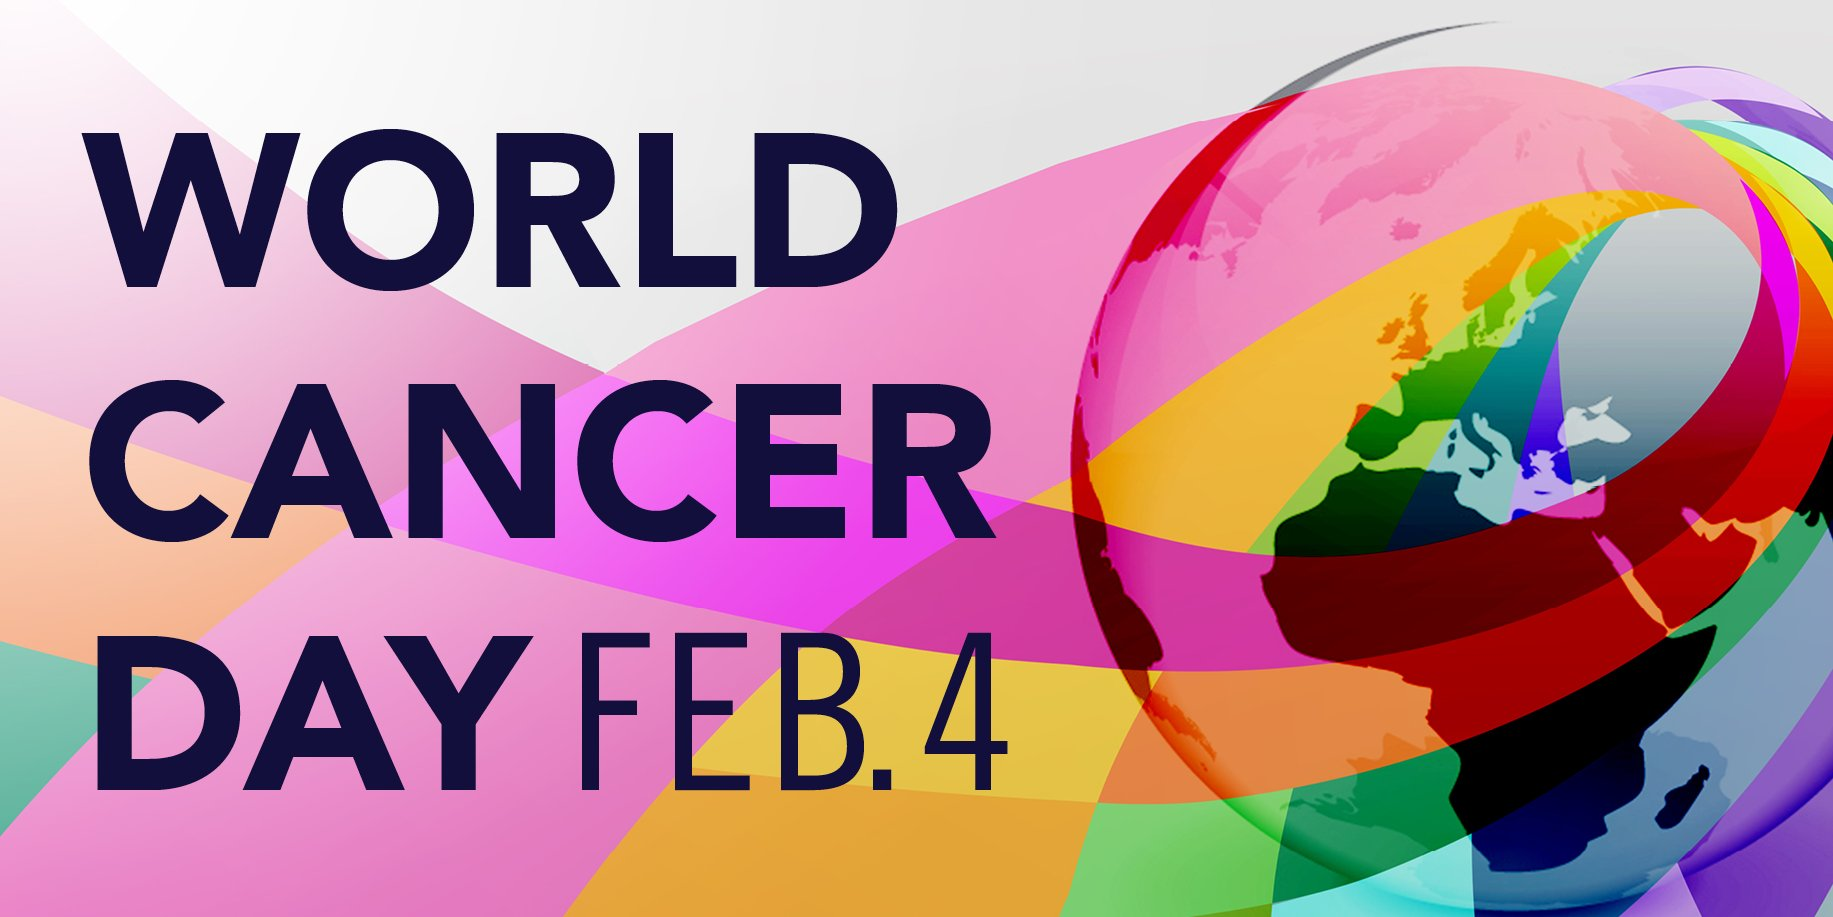 It's #WorldCancerDay. Make your actions count against #cancer. Tips to get involved: https://t.co/NSBjji19k5 https://t.co/8TvdlkPpxS